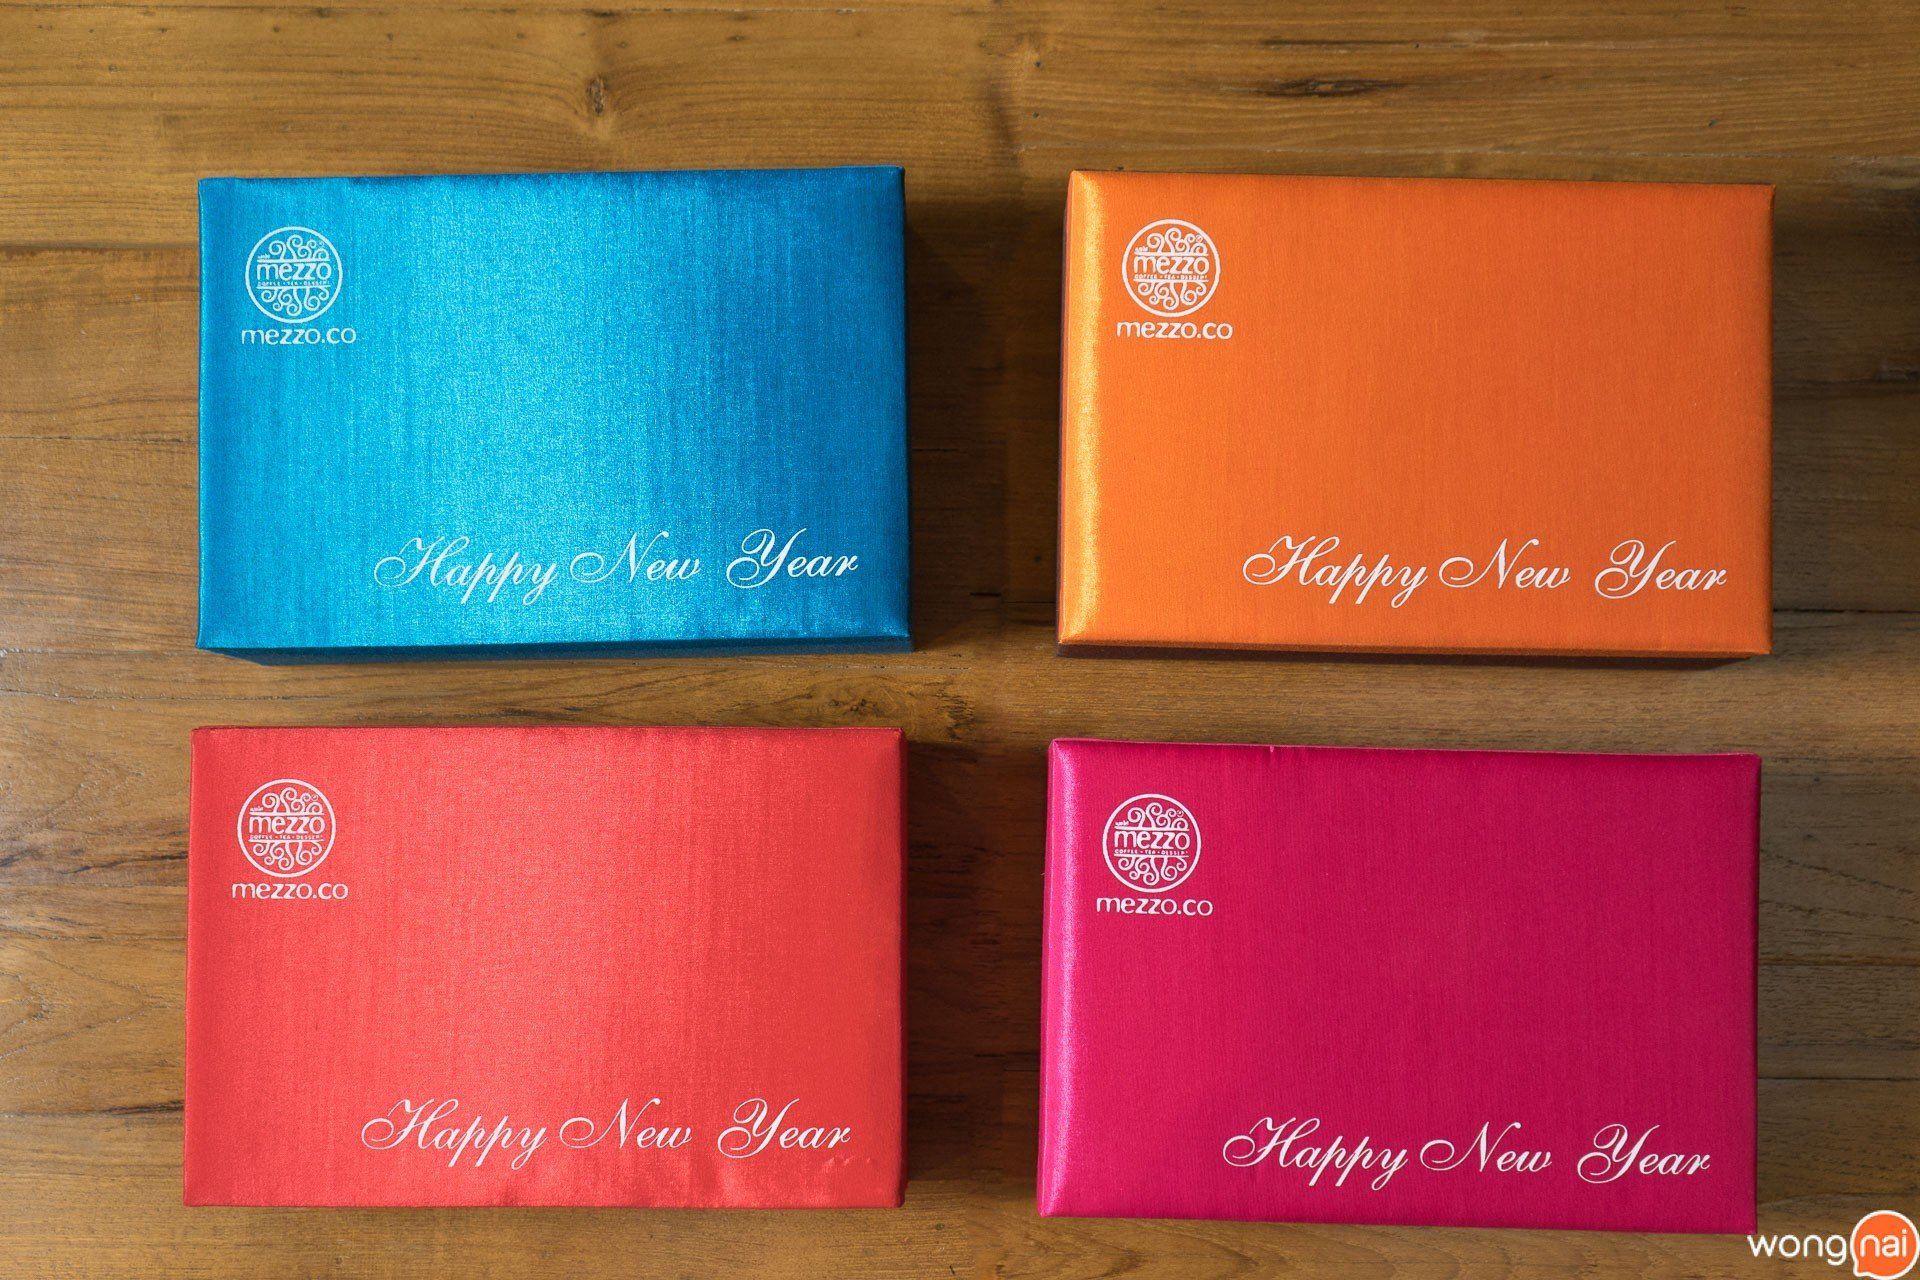 Cookies Silk Box Gift Set ของ ร้านกาแฟและเบเกอรี Mezzo Coffee